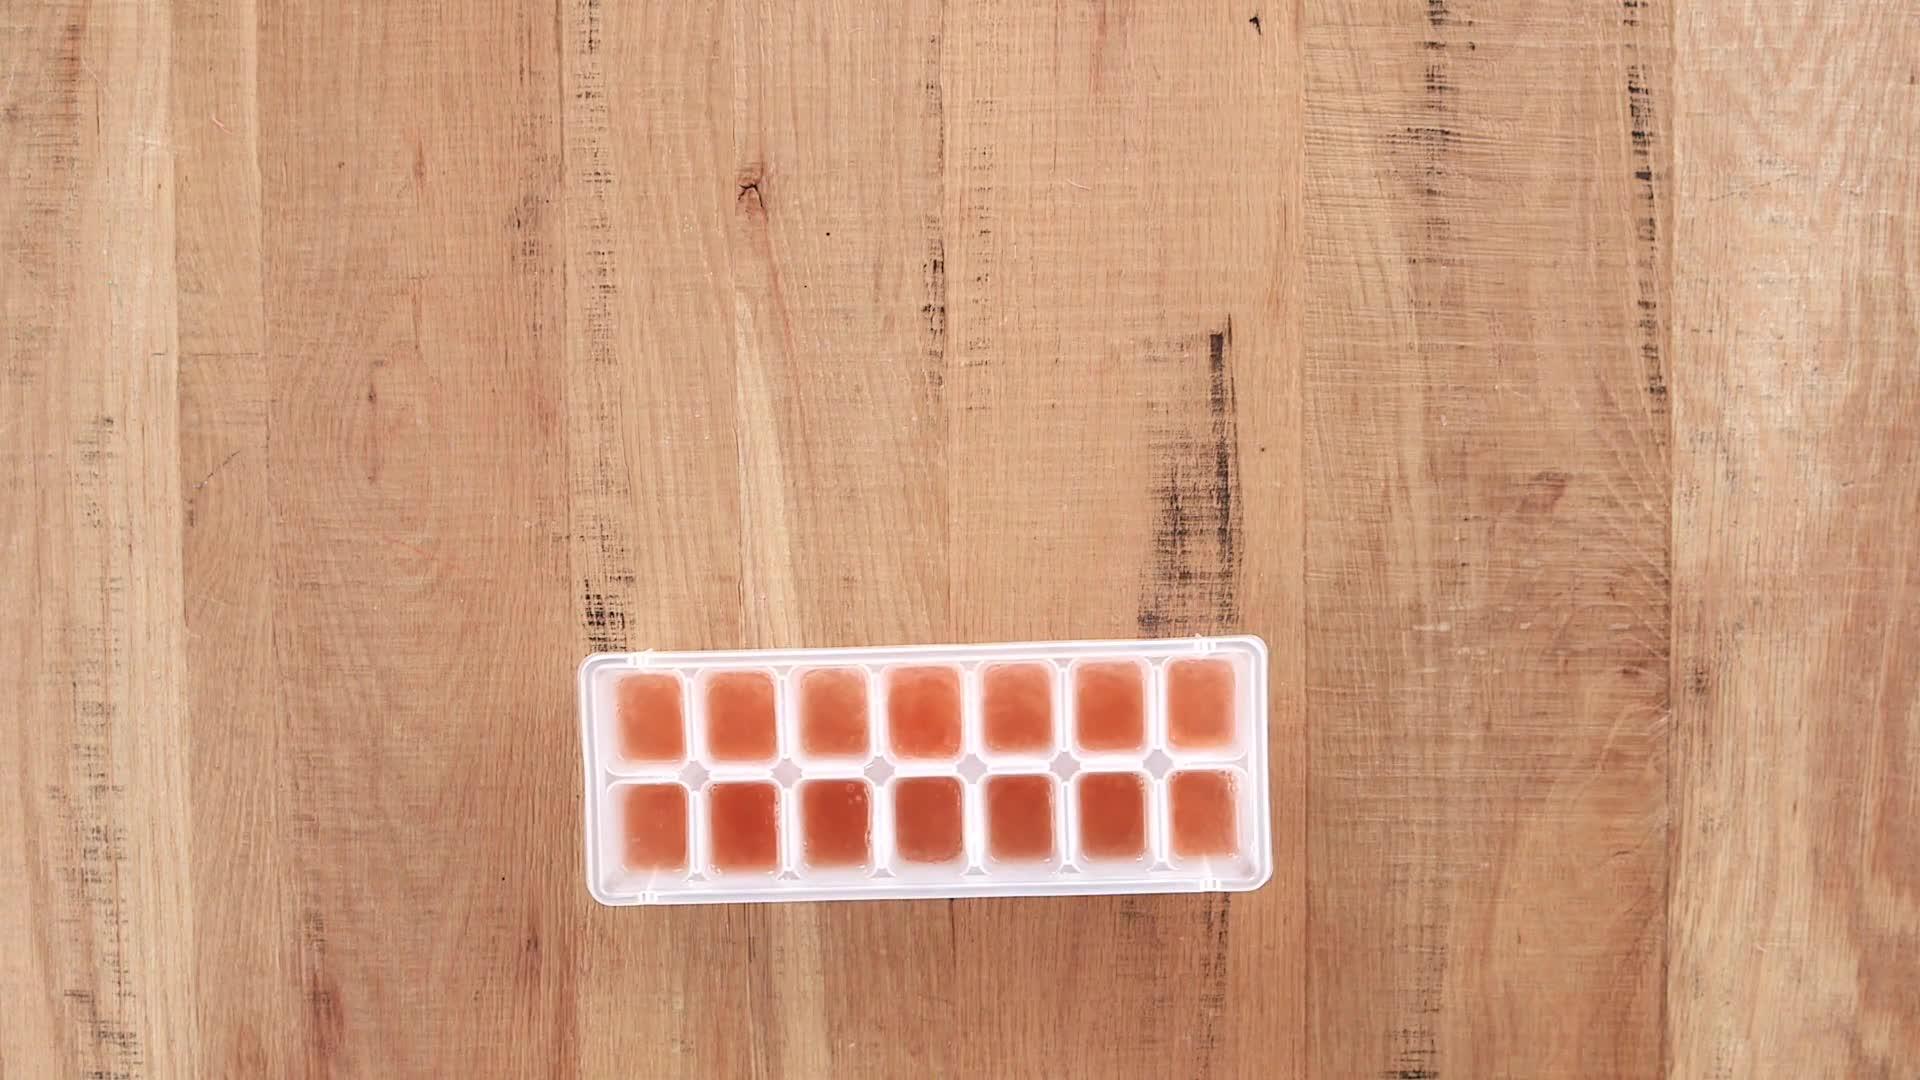 Rosé Ice Cubes